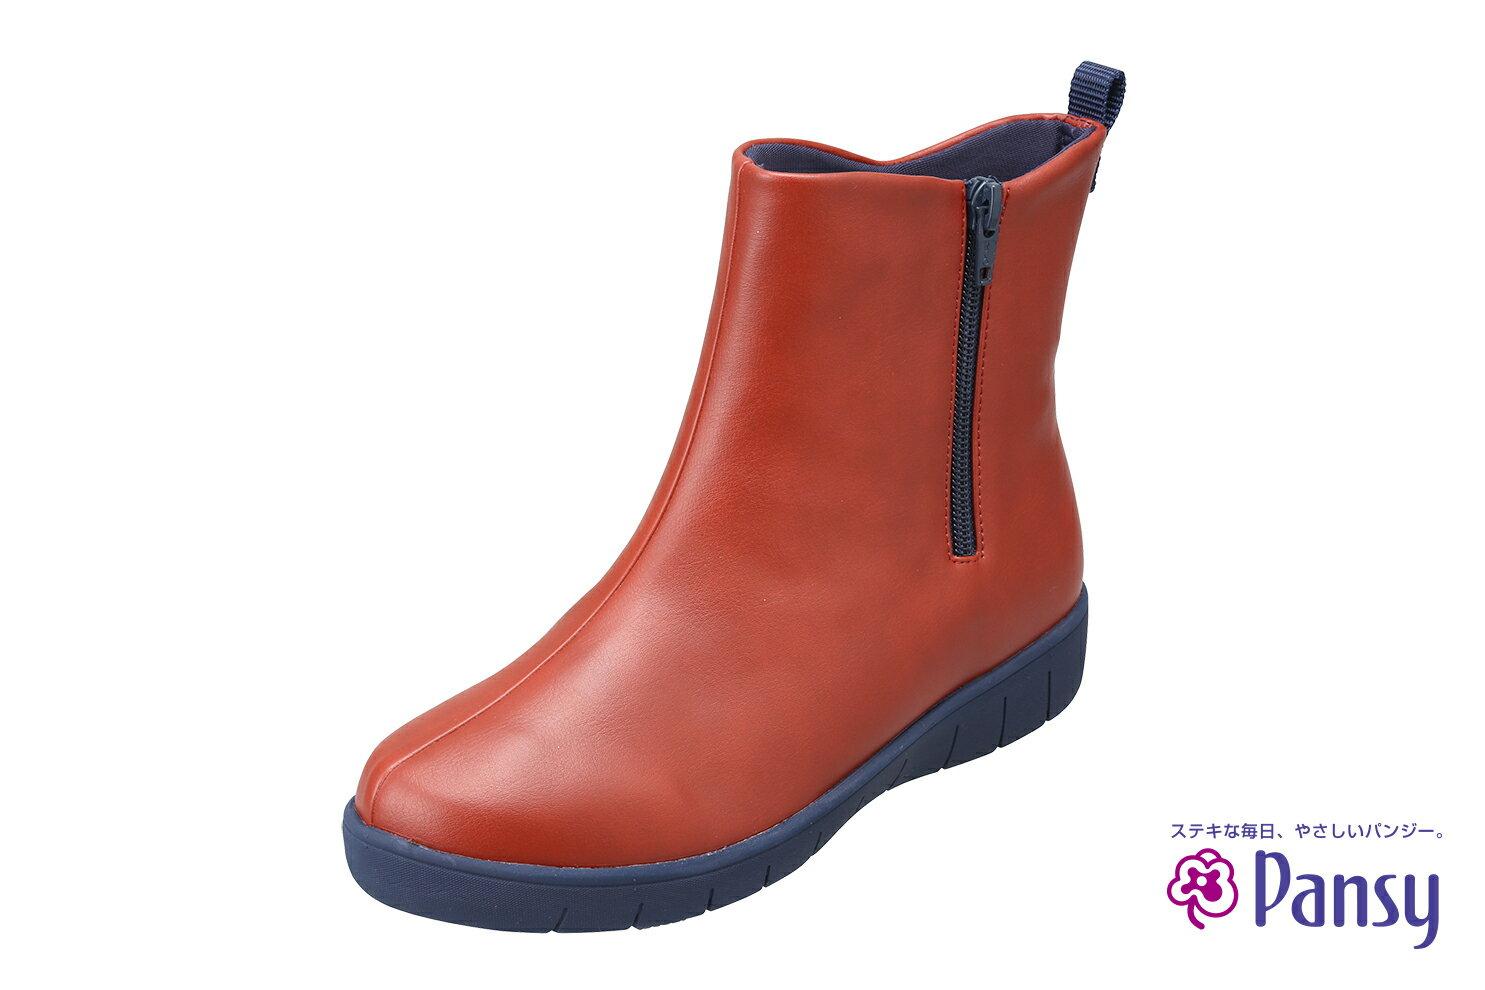 PANSY 女性 時尚撞色 短筒雨鞋 QA4944 7